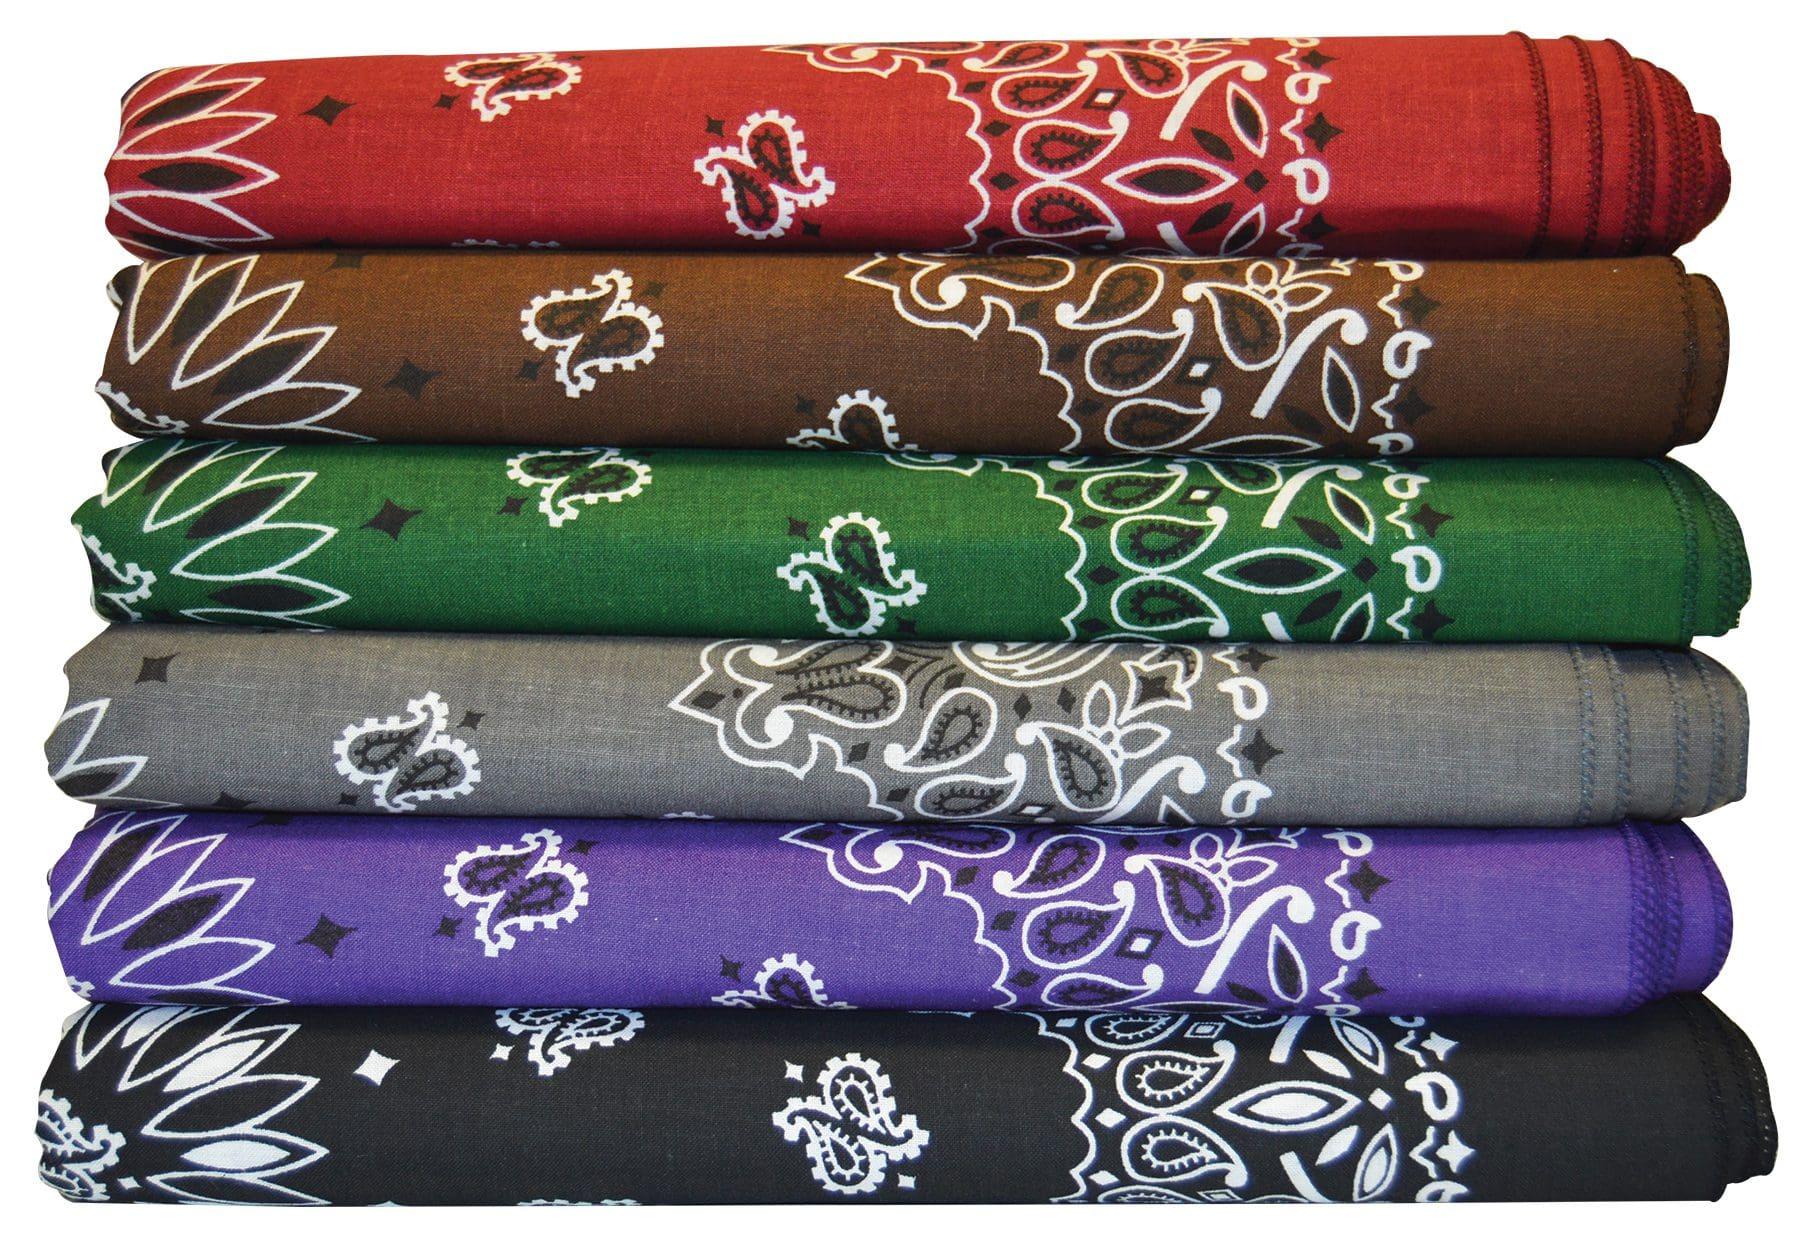 dark colored bandannas variety stacked